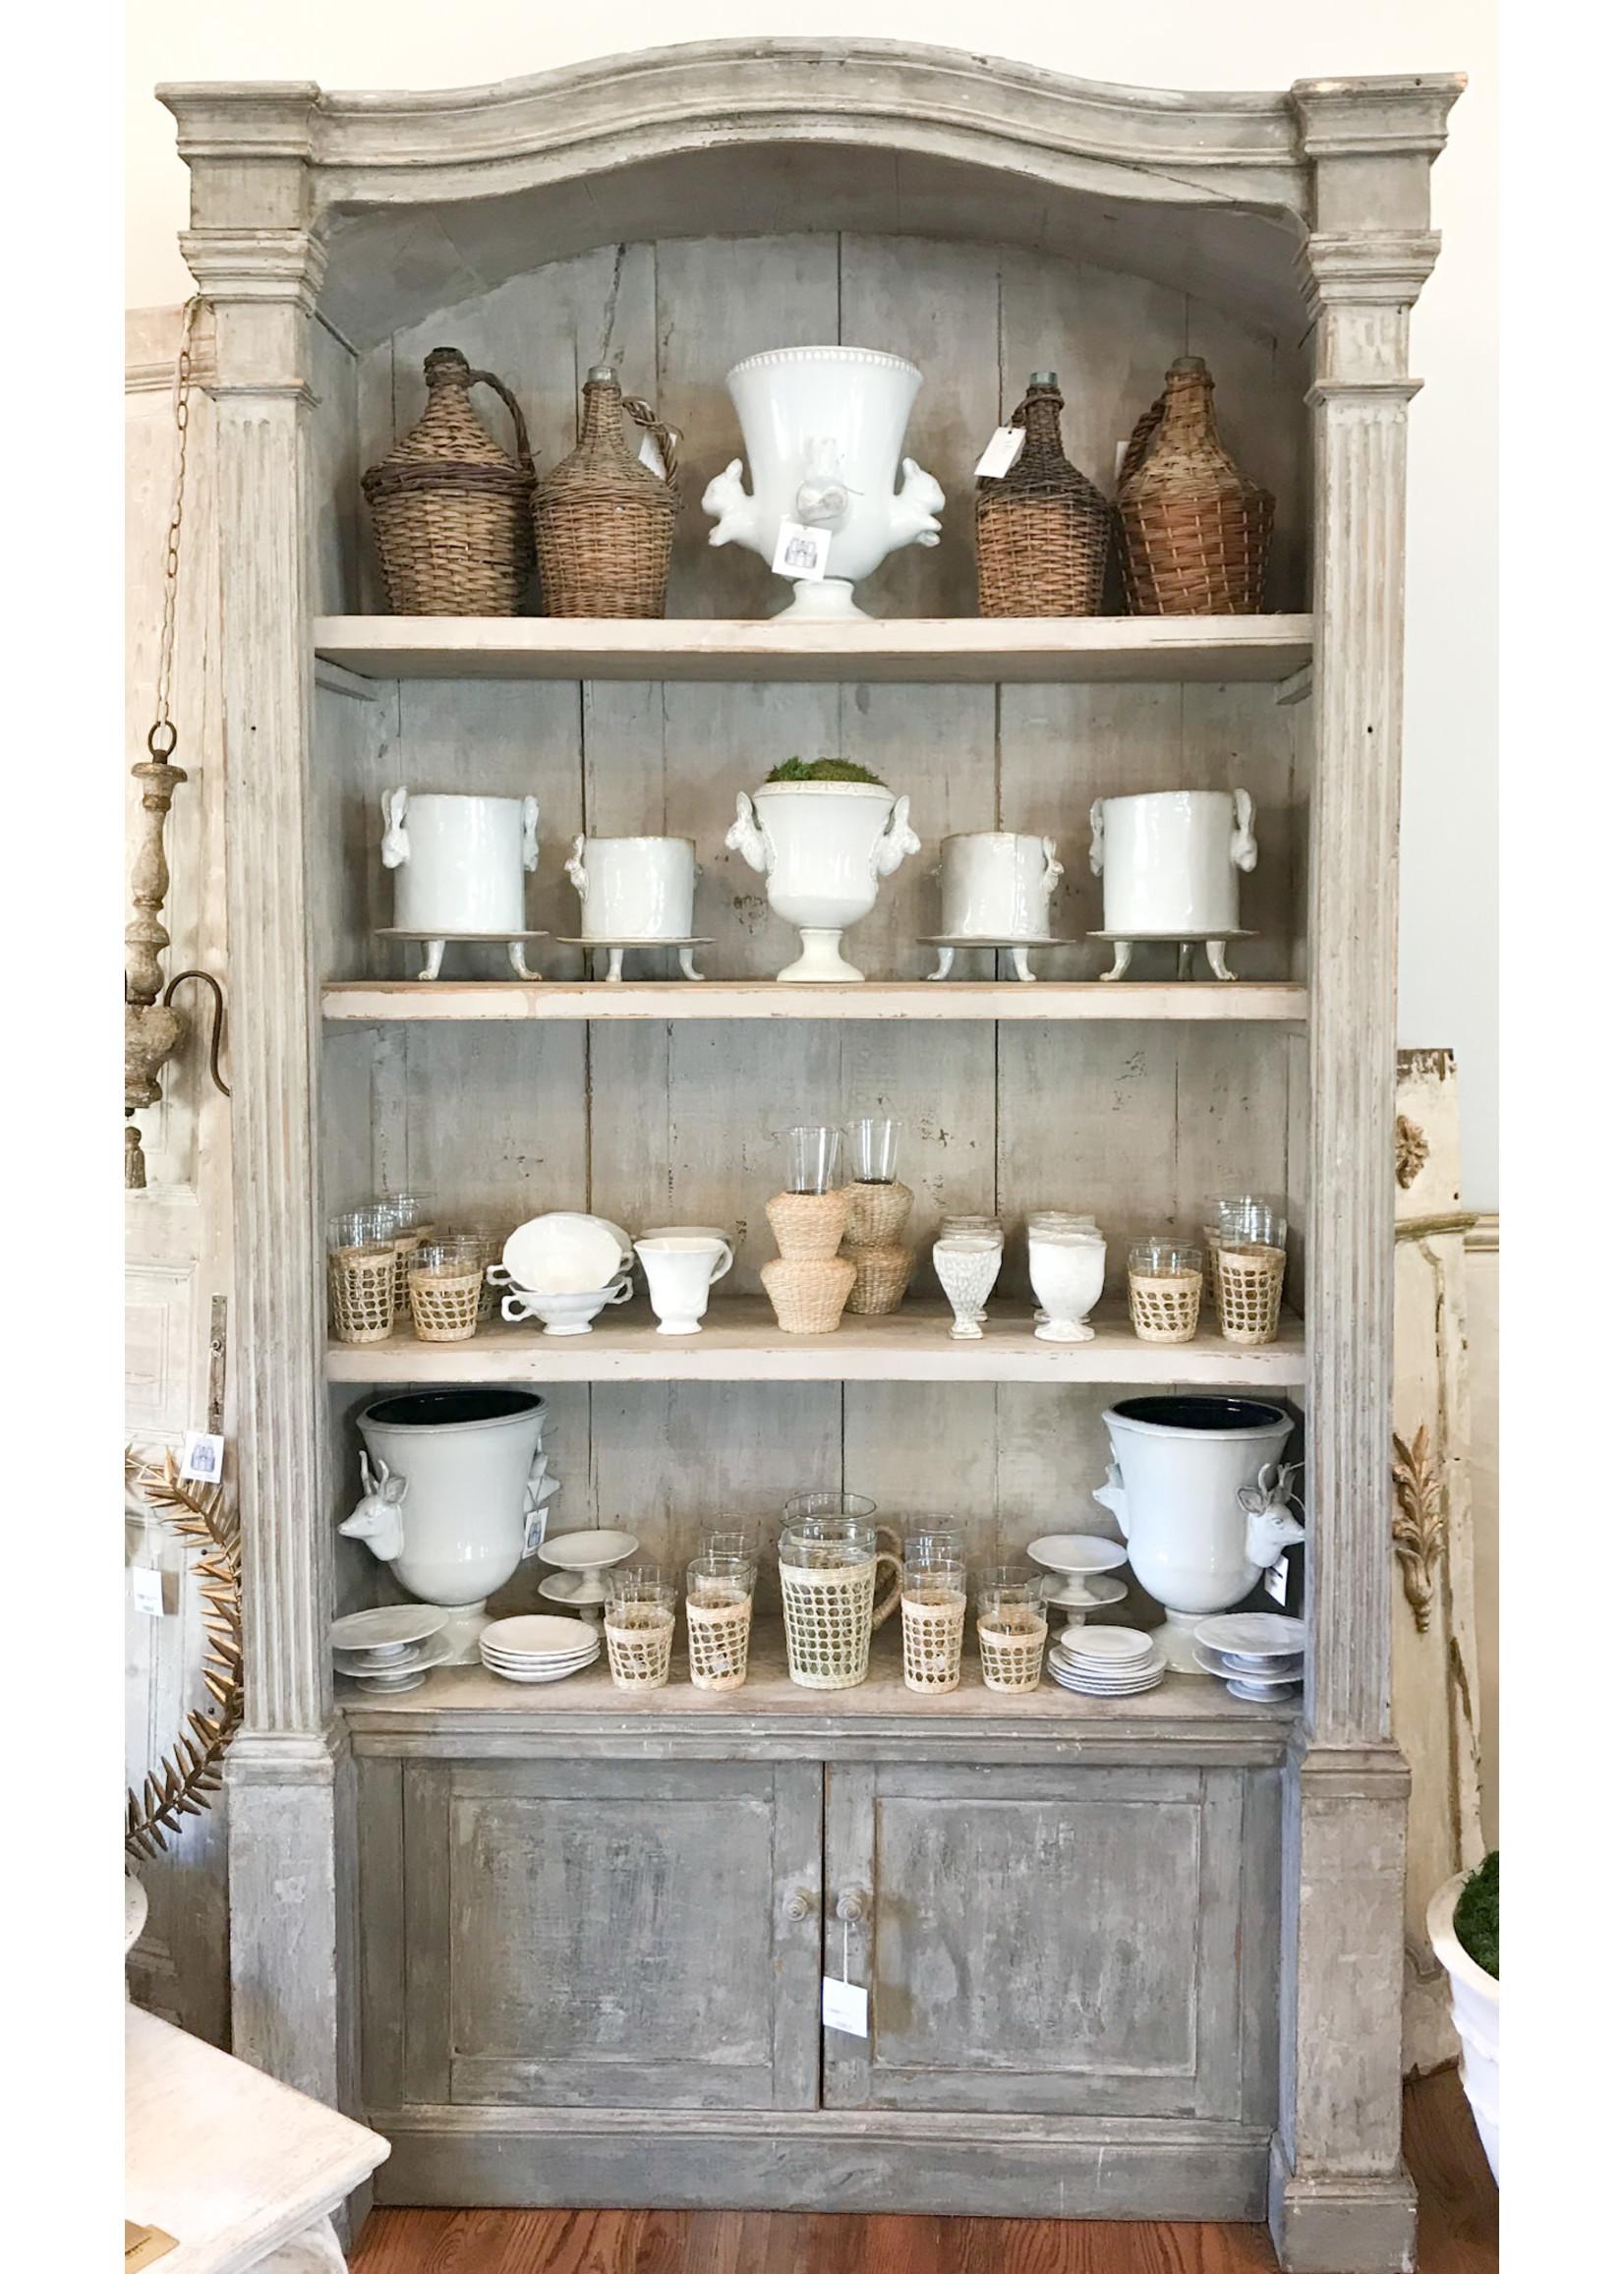 Antique Bookshelf from France